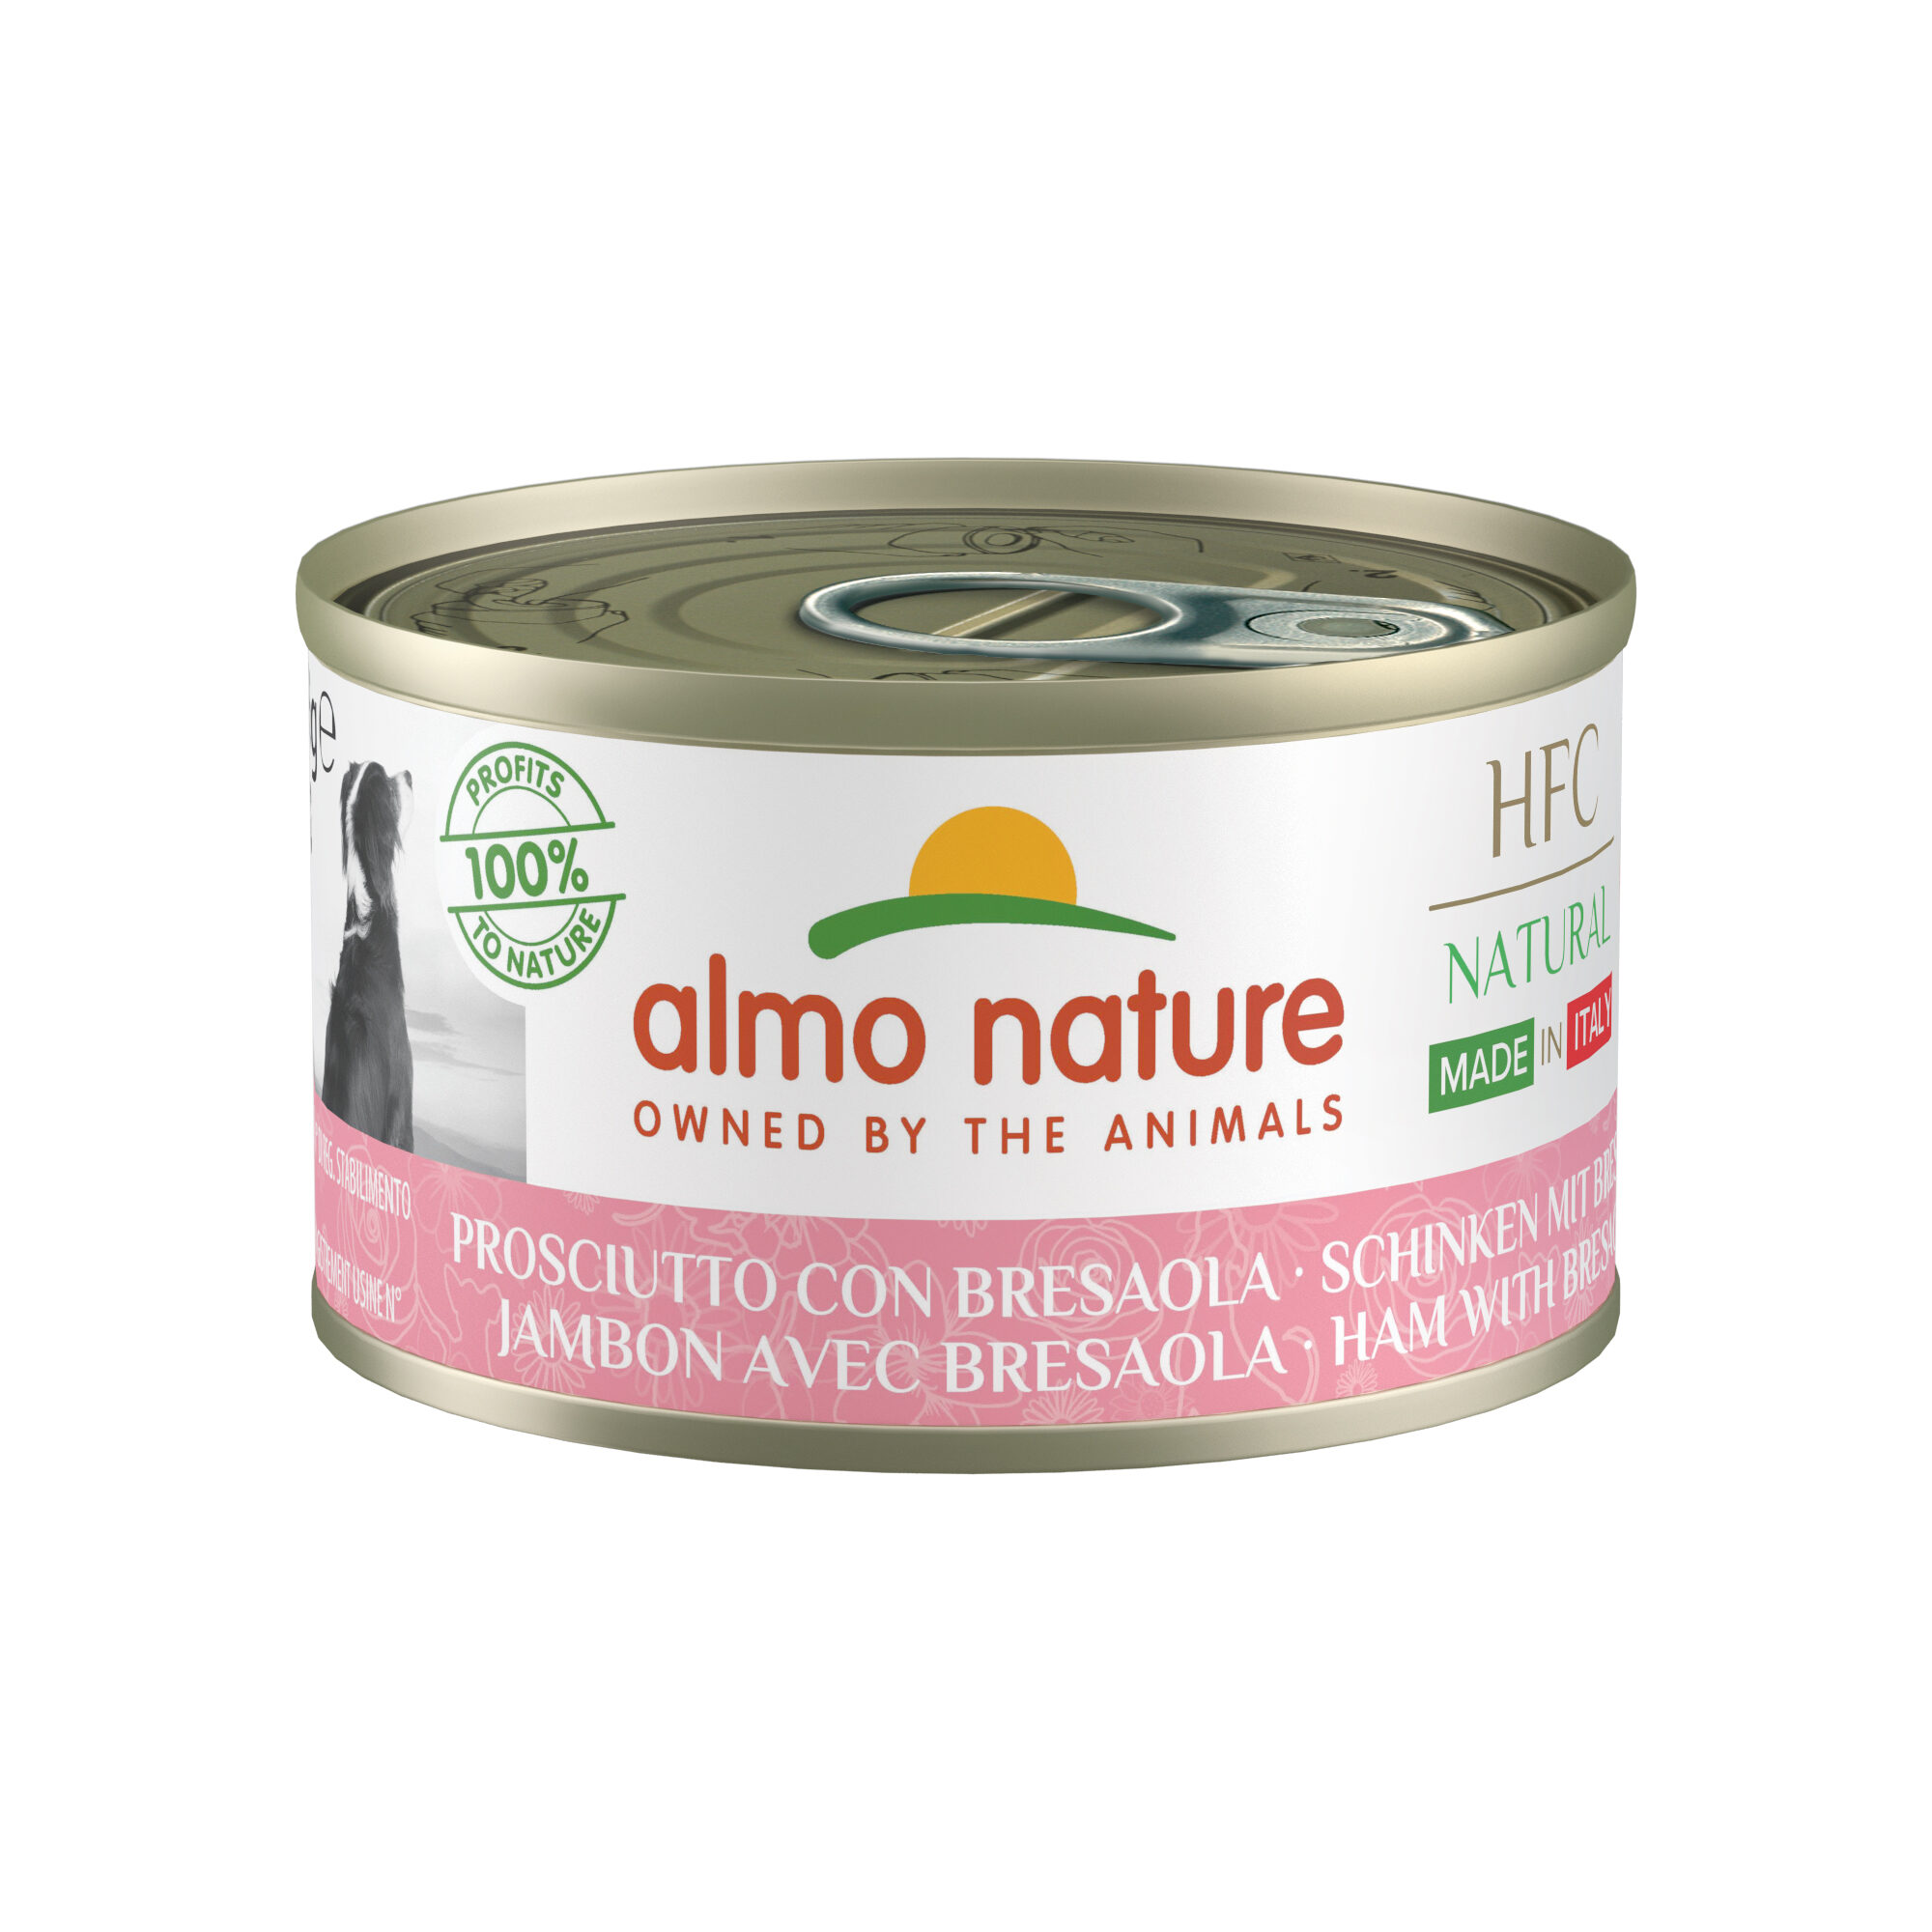 Almo Nature HFC Natural Made en Italy - Jambon et bresaola - 24 x 95